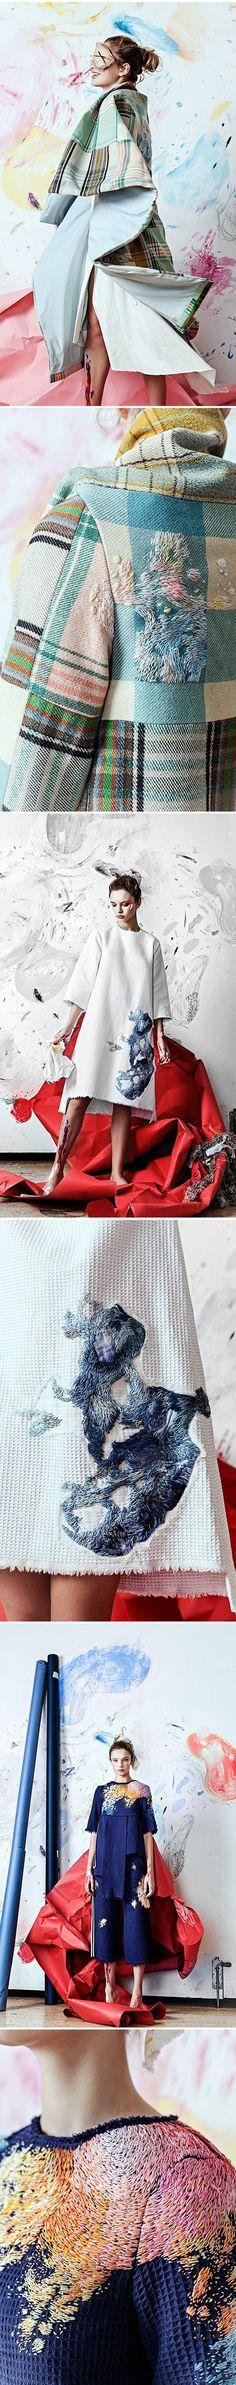 Olya Glagoleva clothes with embroidery by Lisa Smirnova